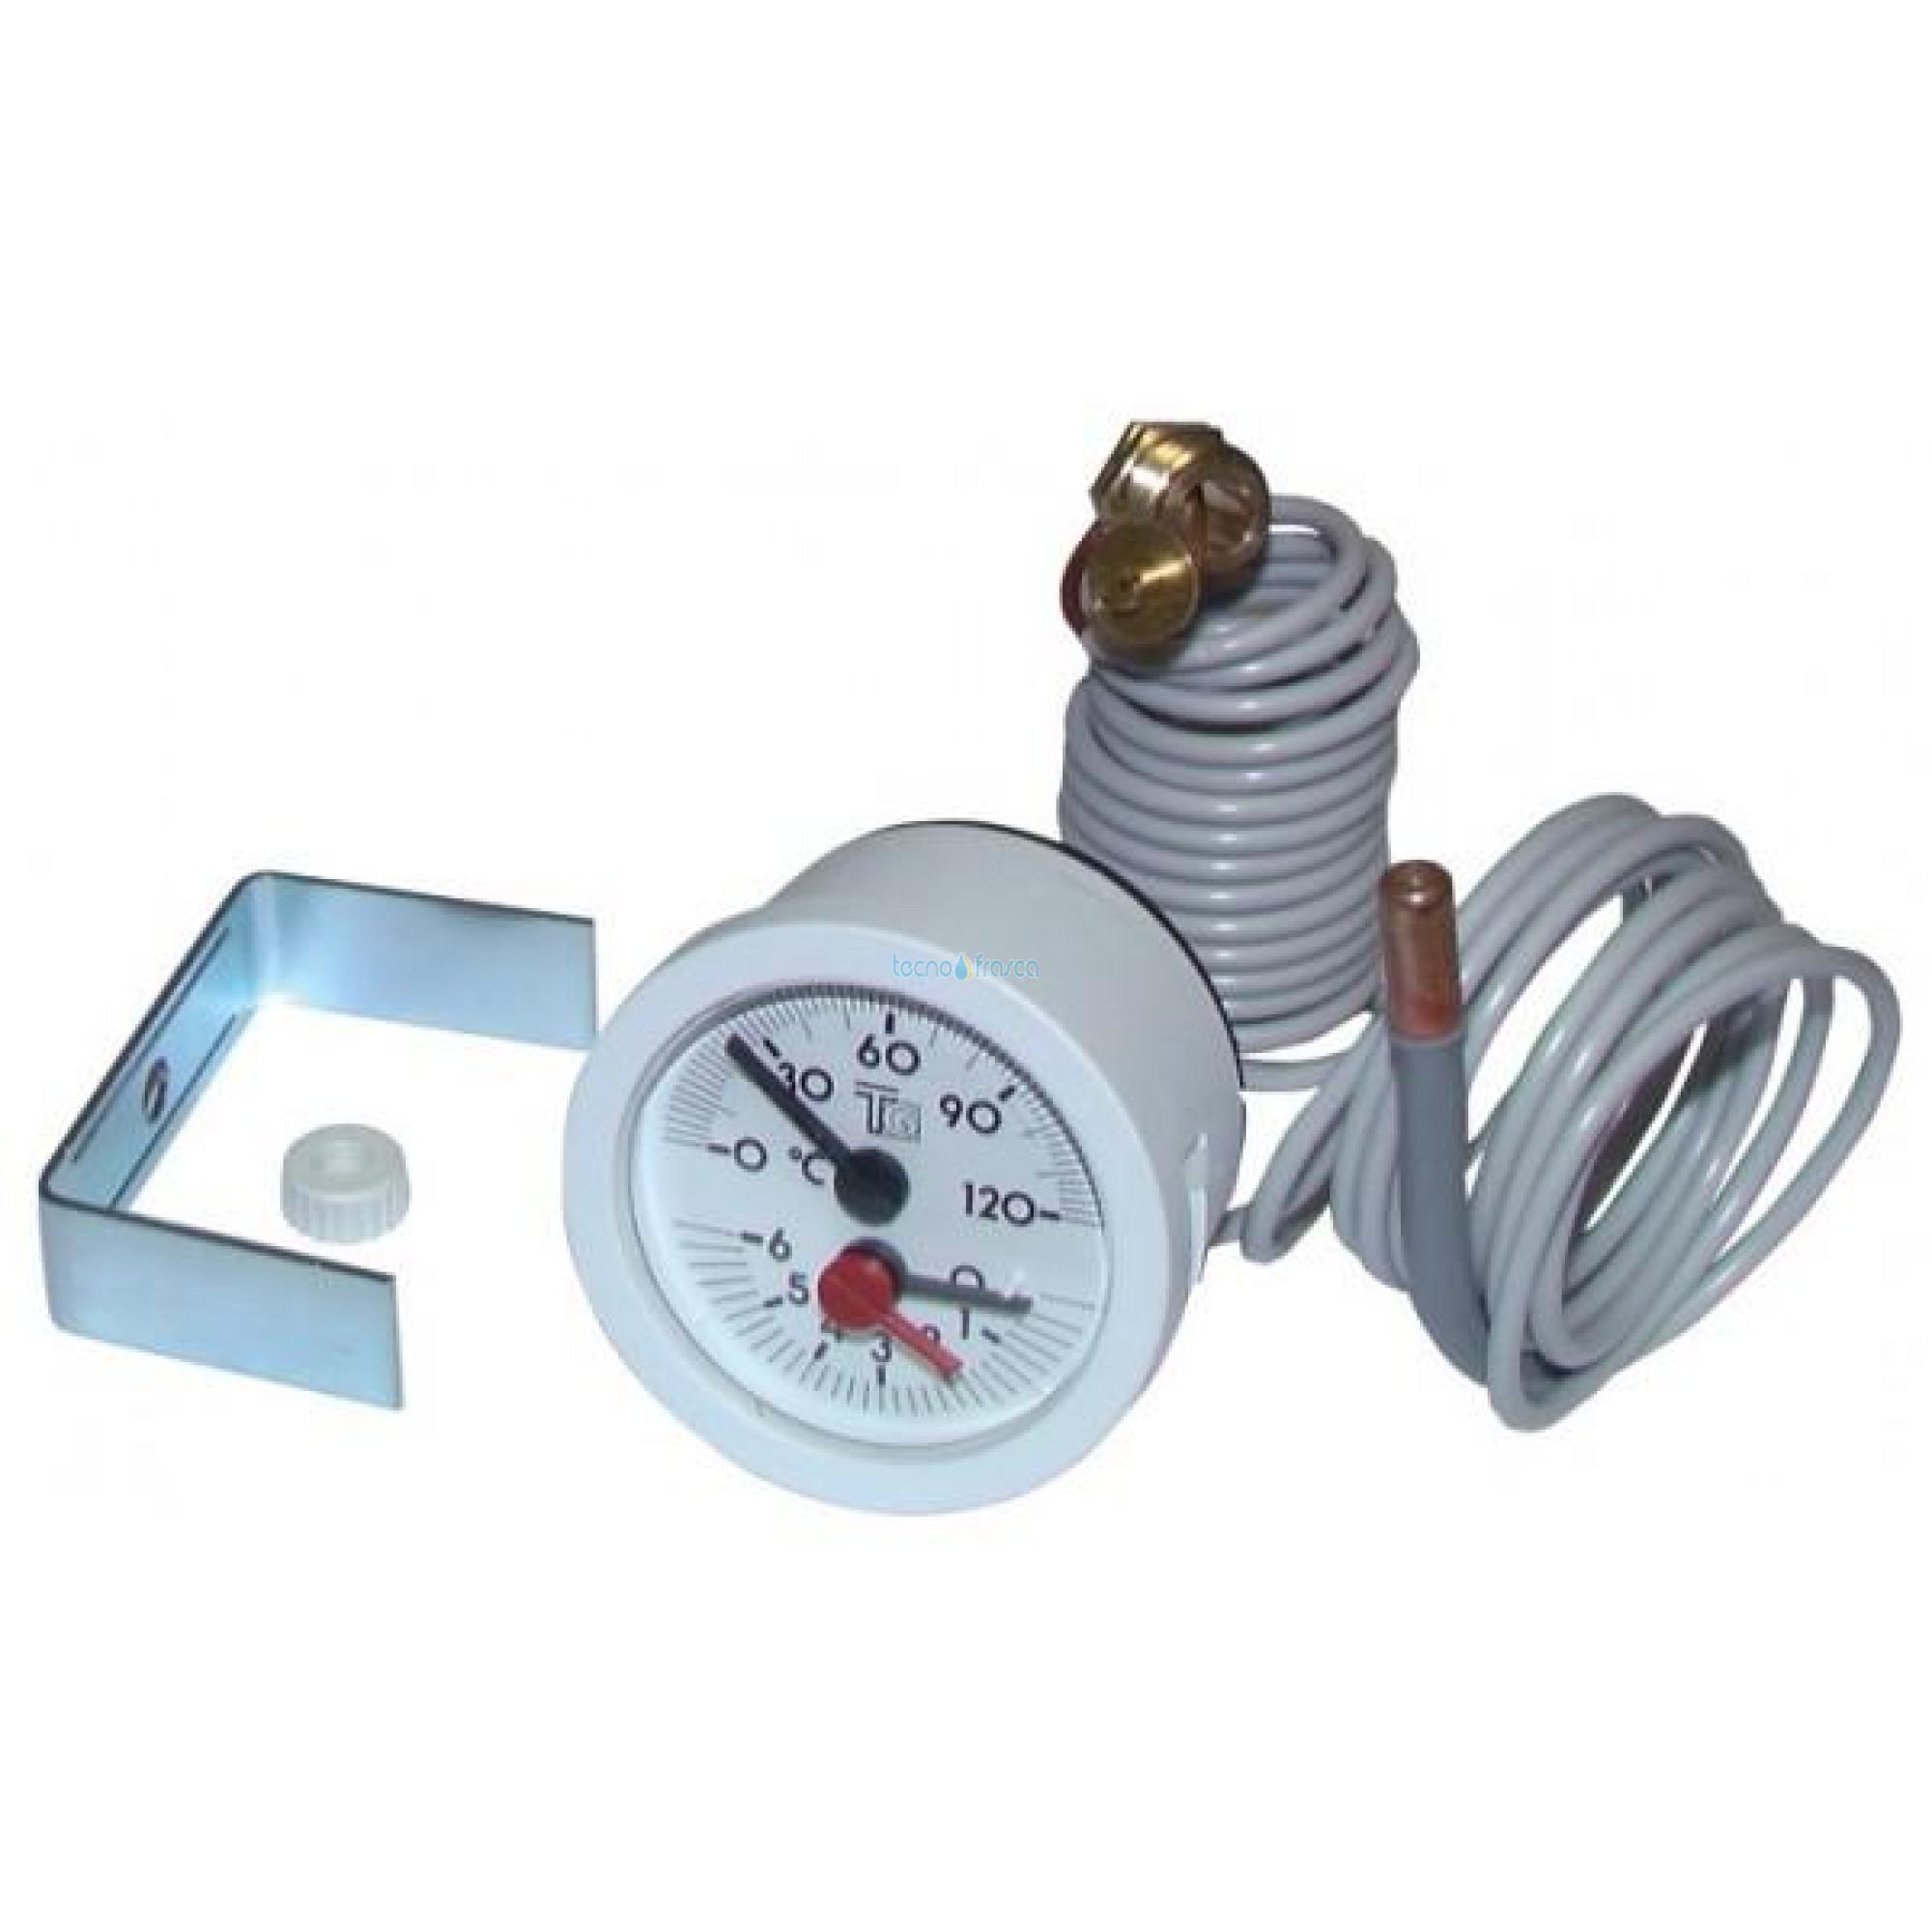 Ferroli termoidrometro 0-6 bar senza cavo 39802620